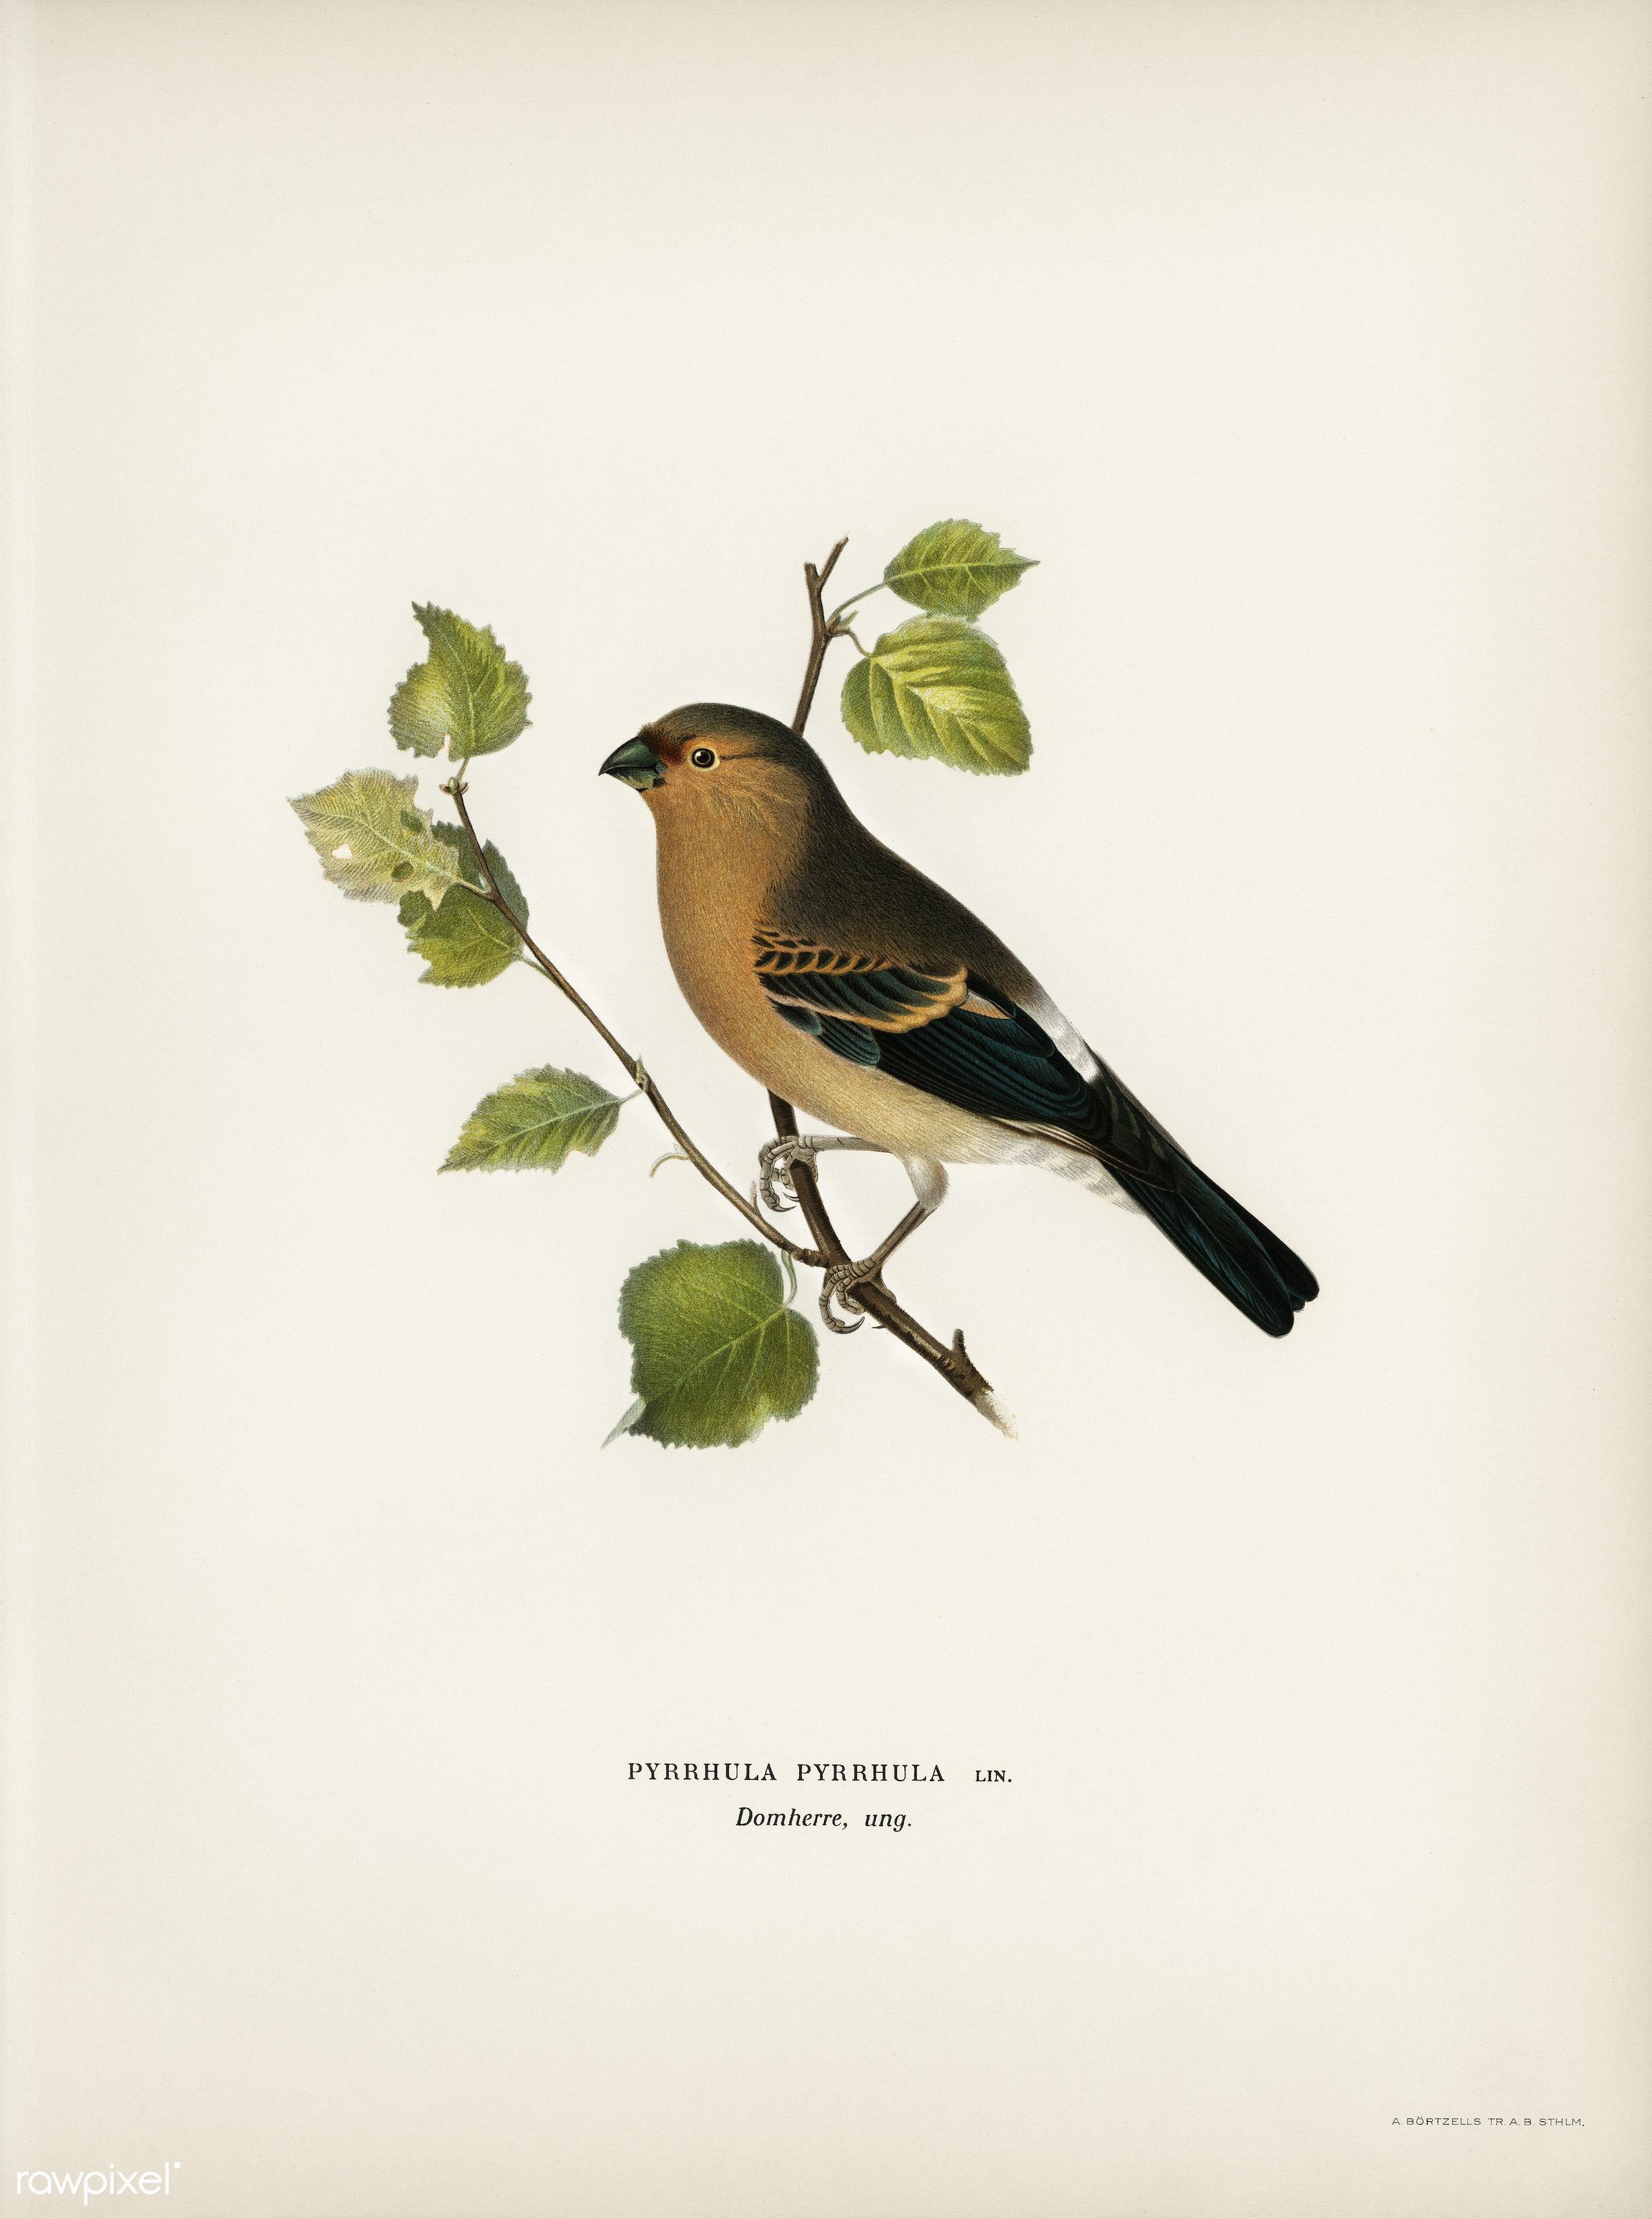 Eurasian Bullfinch (Pyrrhula pyrrhula) illustrated by the von Wright brothers. Digitally enhanced from our own 1929 folio...